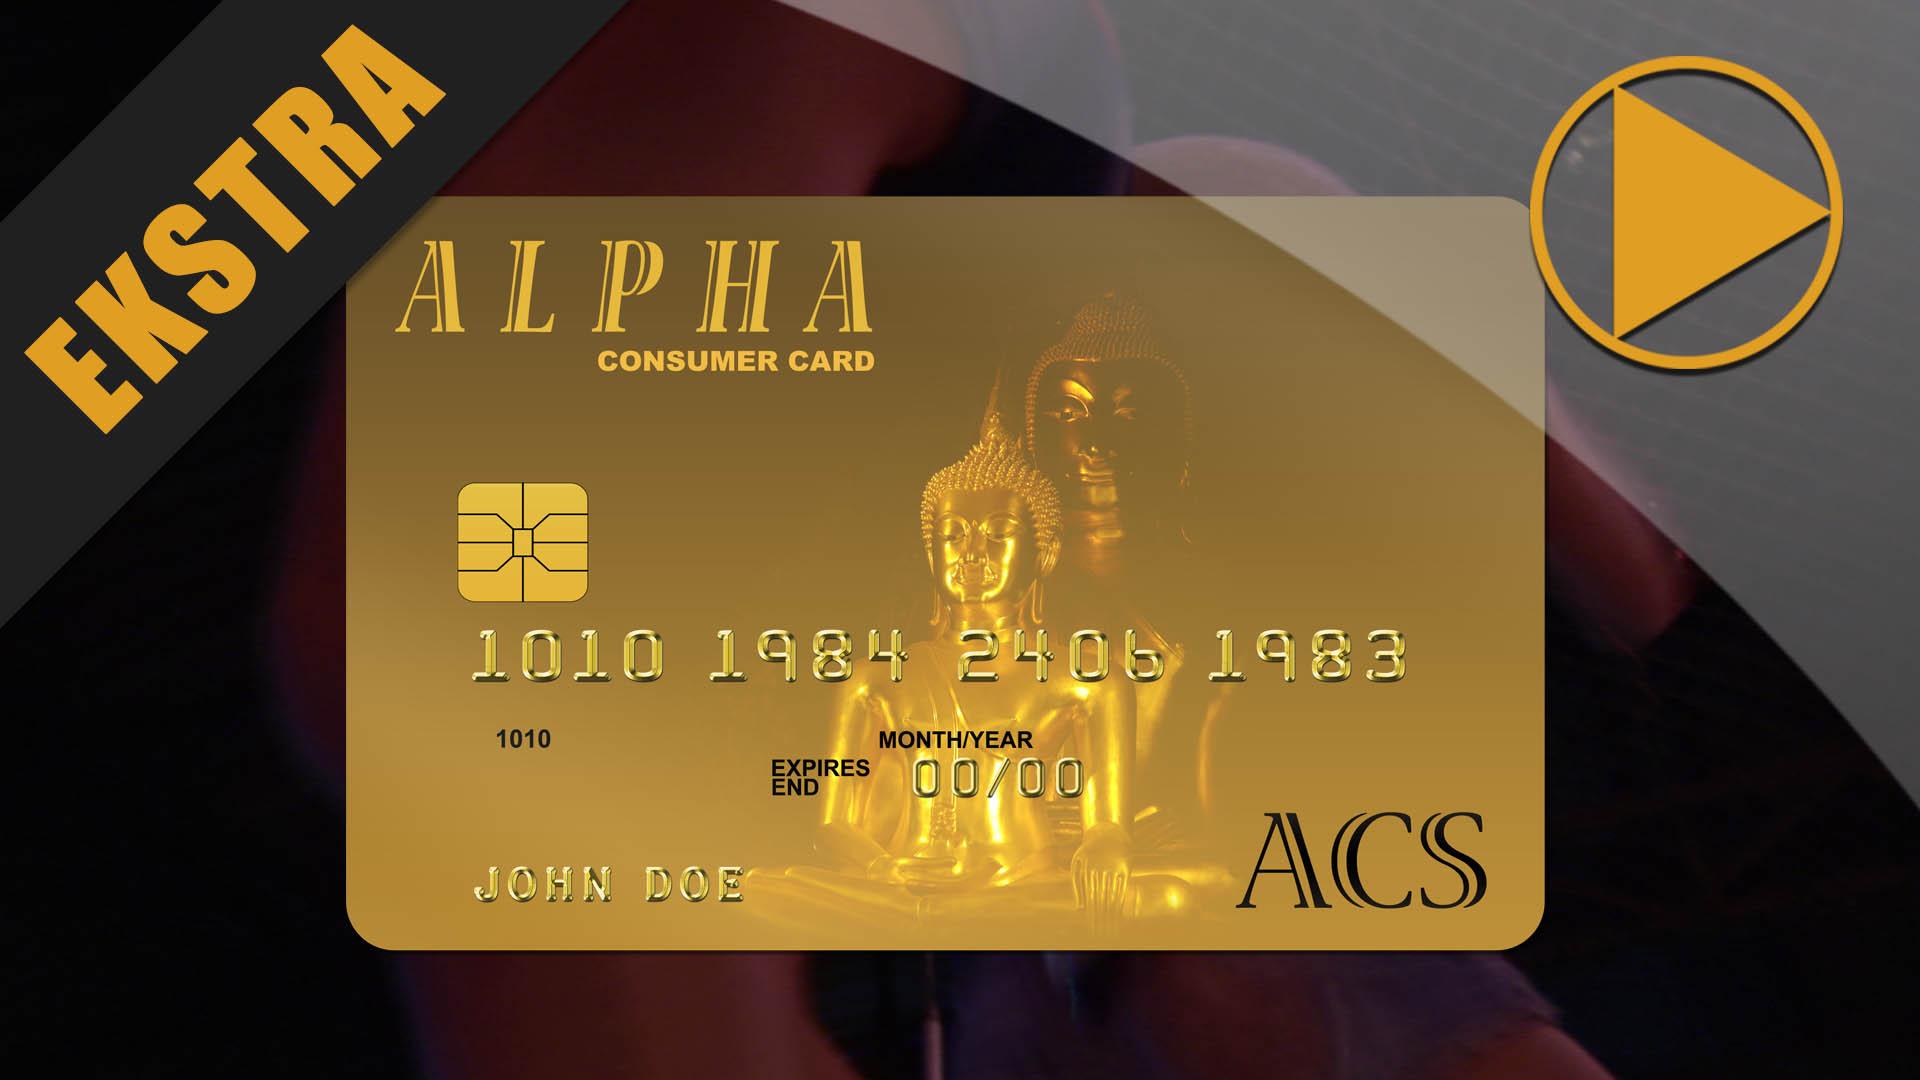 Alpha Consumer Card #1